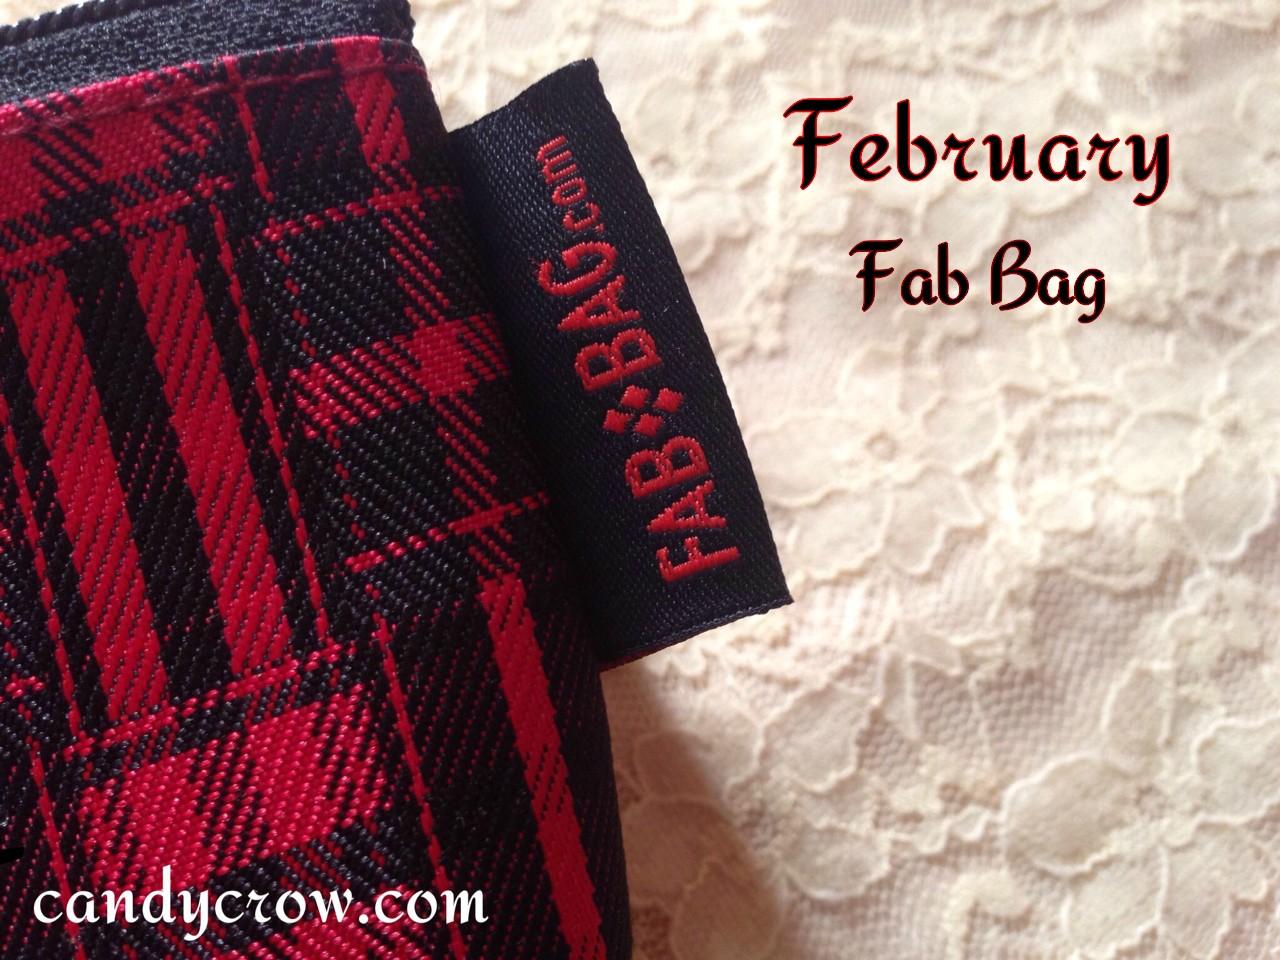 February fab bag